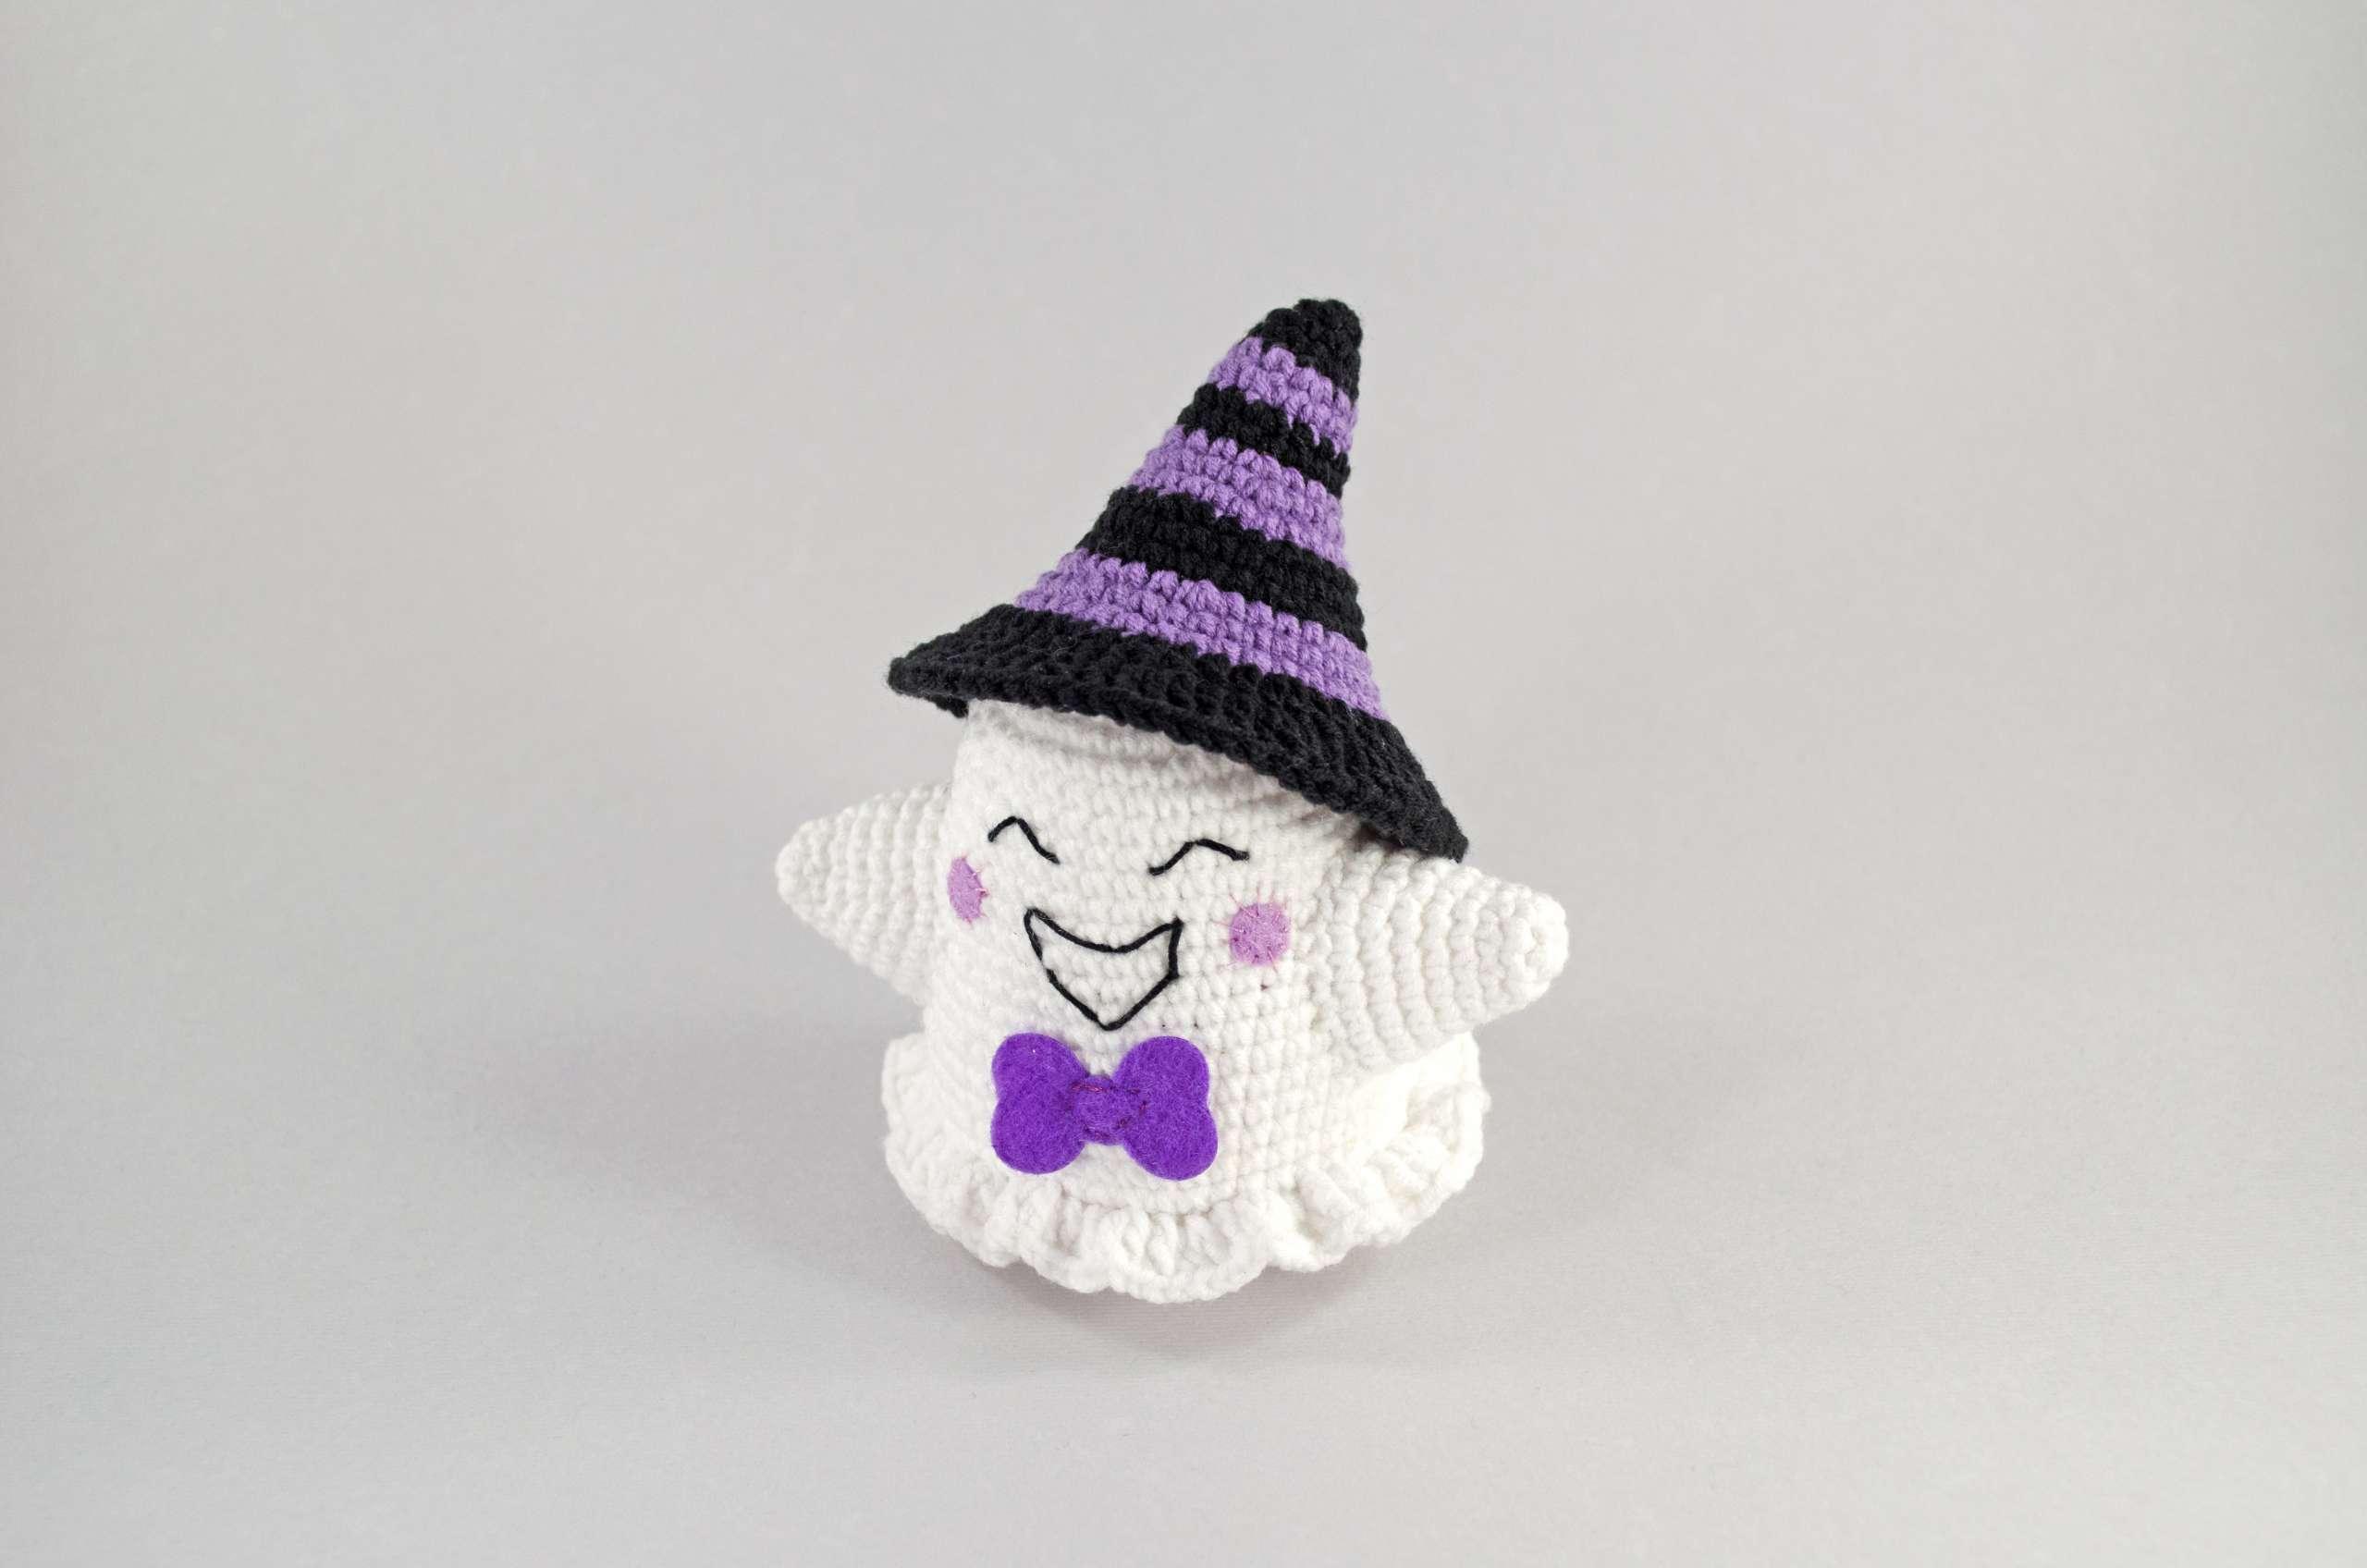 crochet purple ghost front view